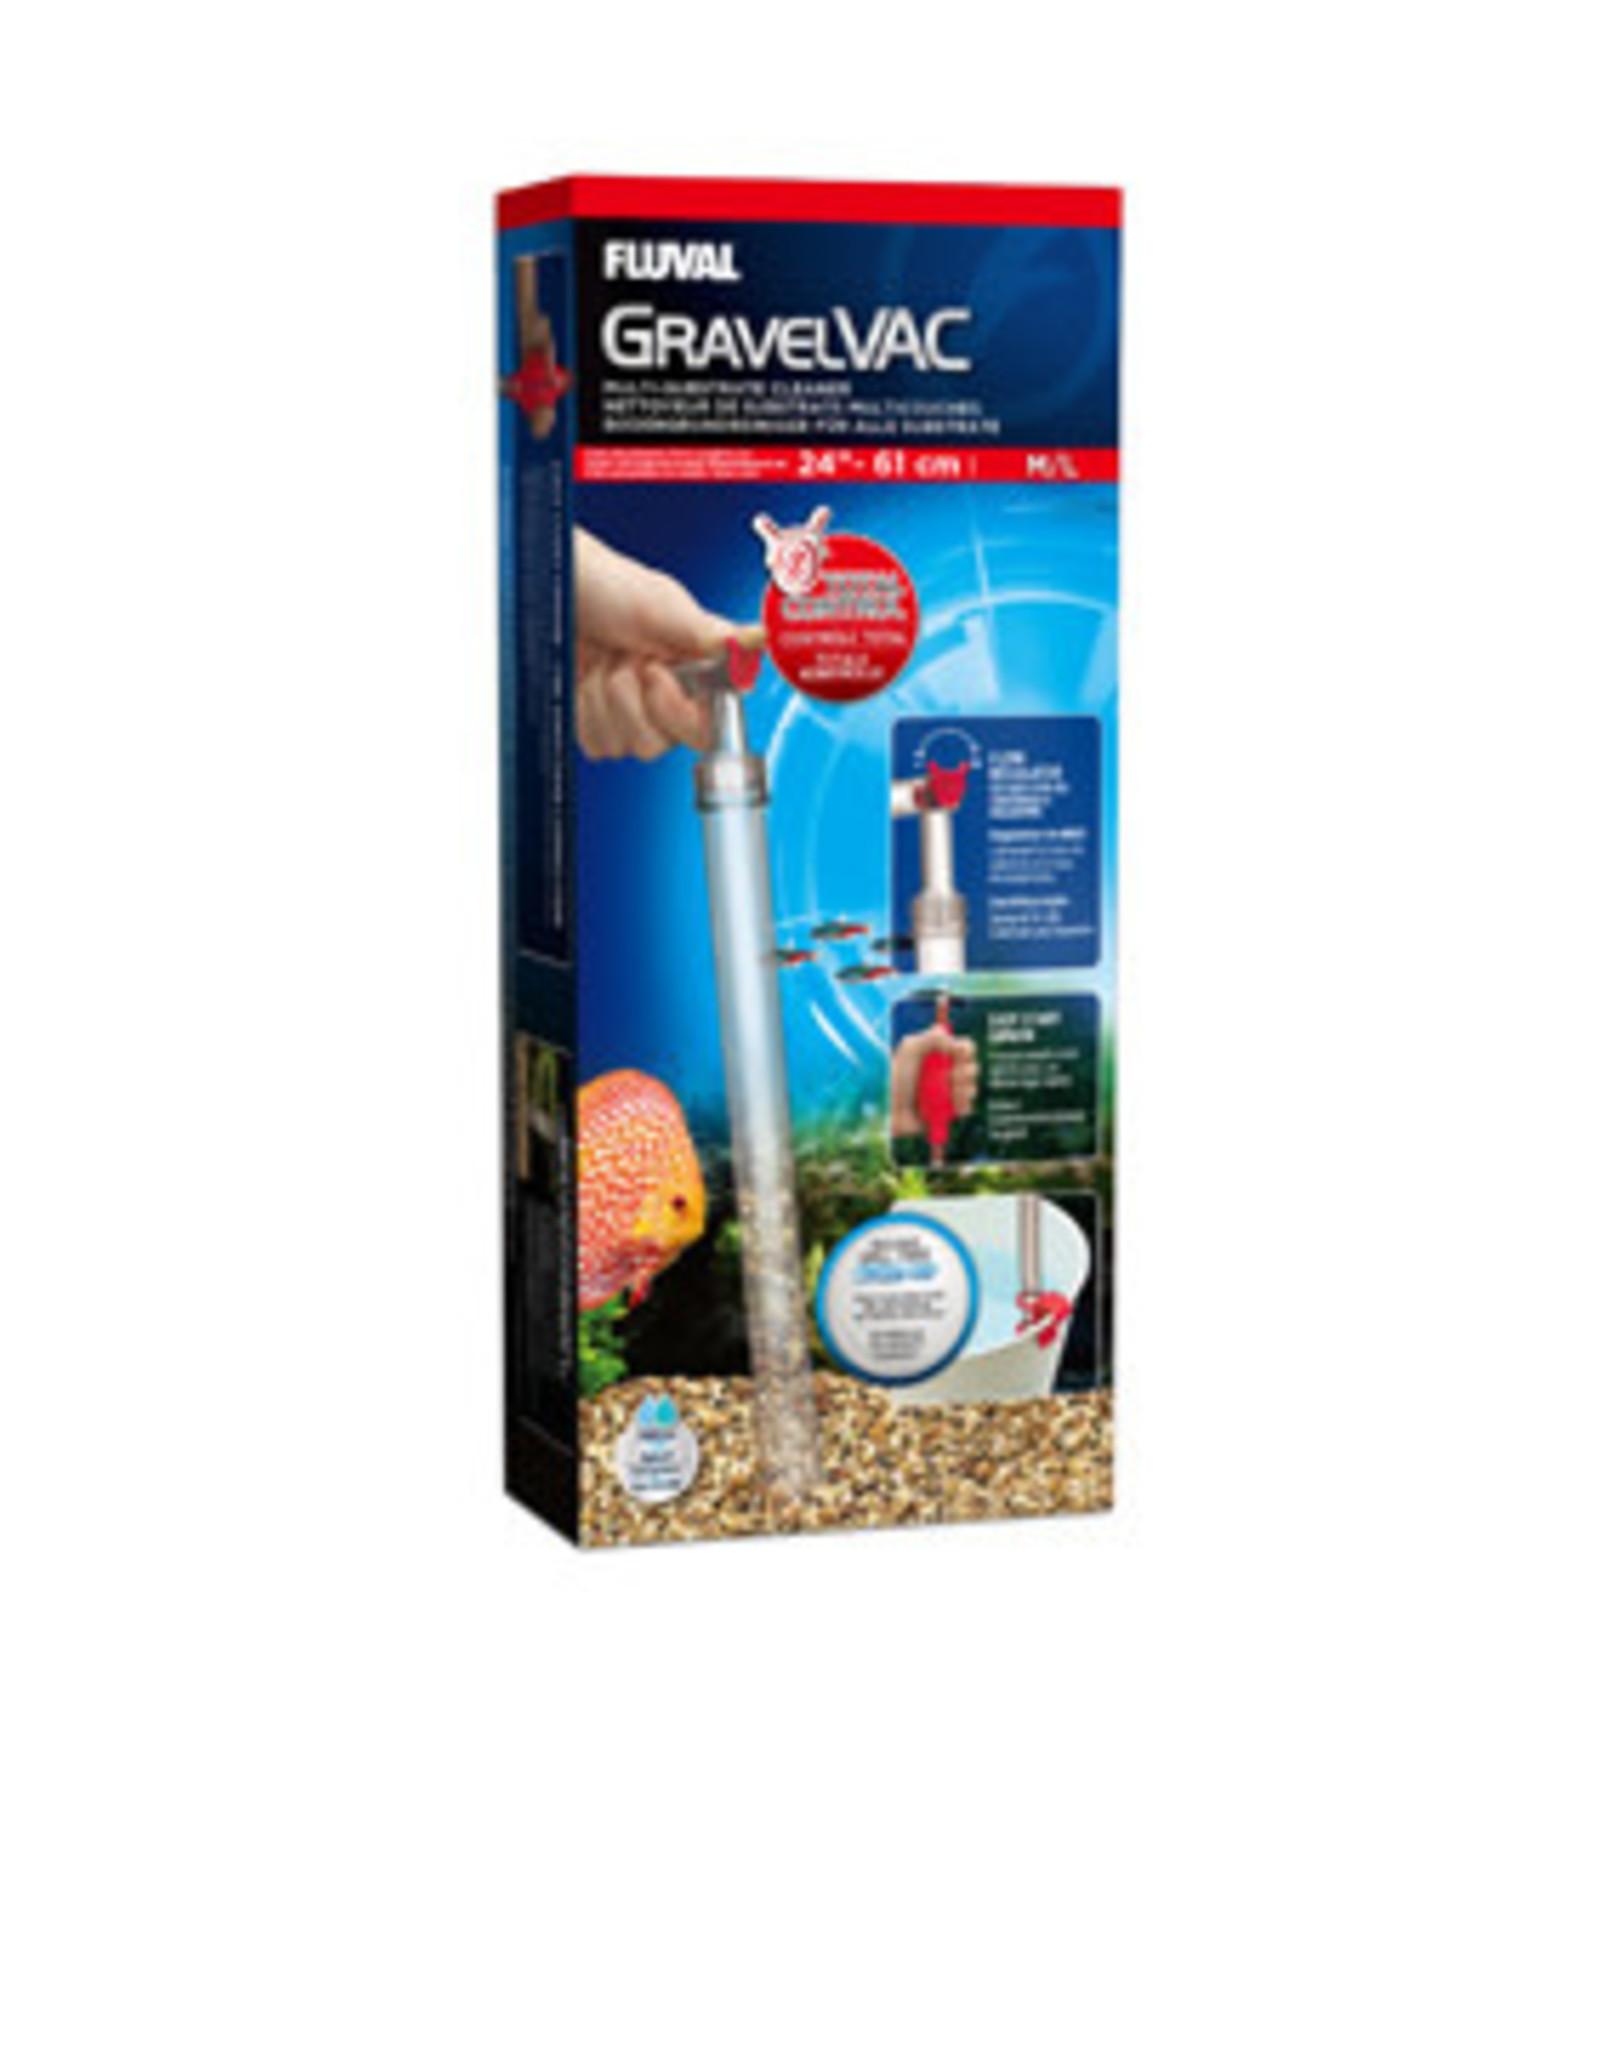 Fluval Fluval Gravel Vac Multi-Substrate Cleaner - Medium / Large